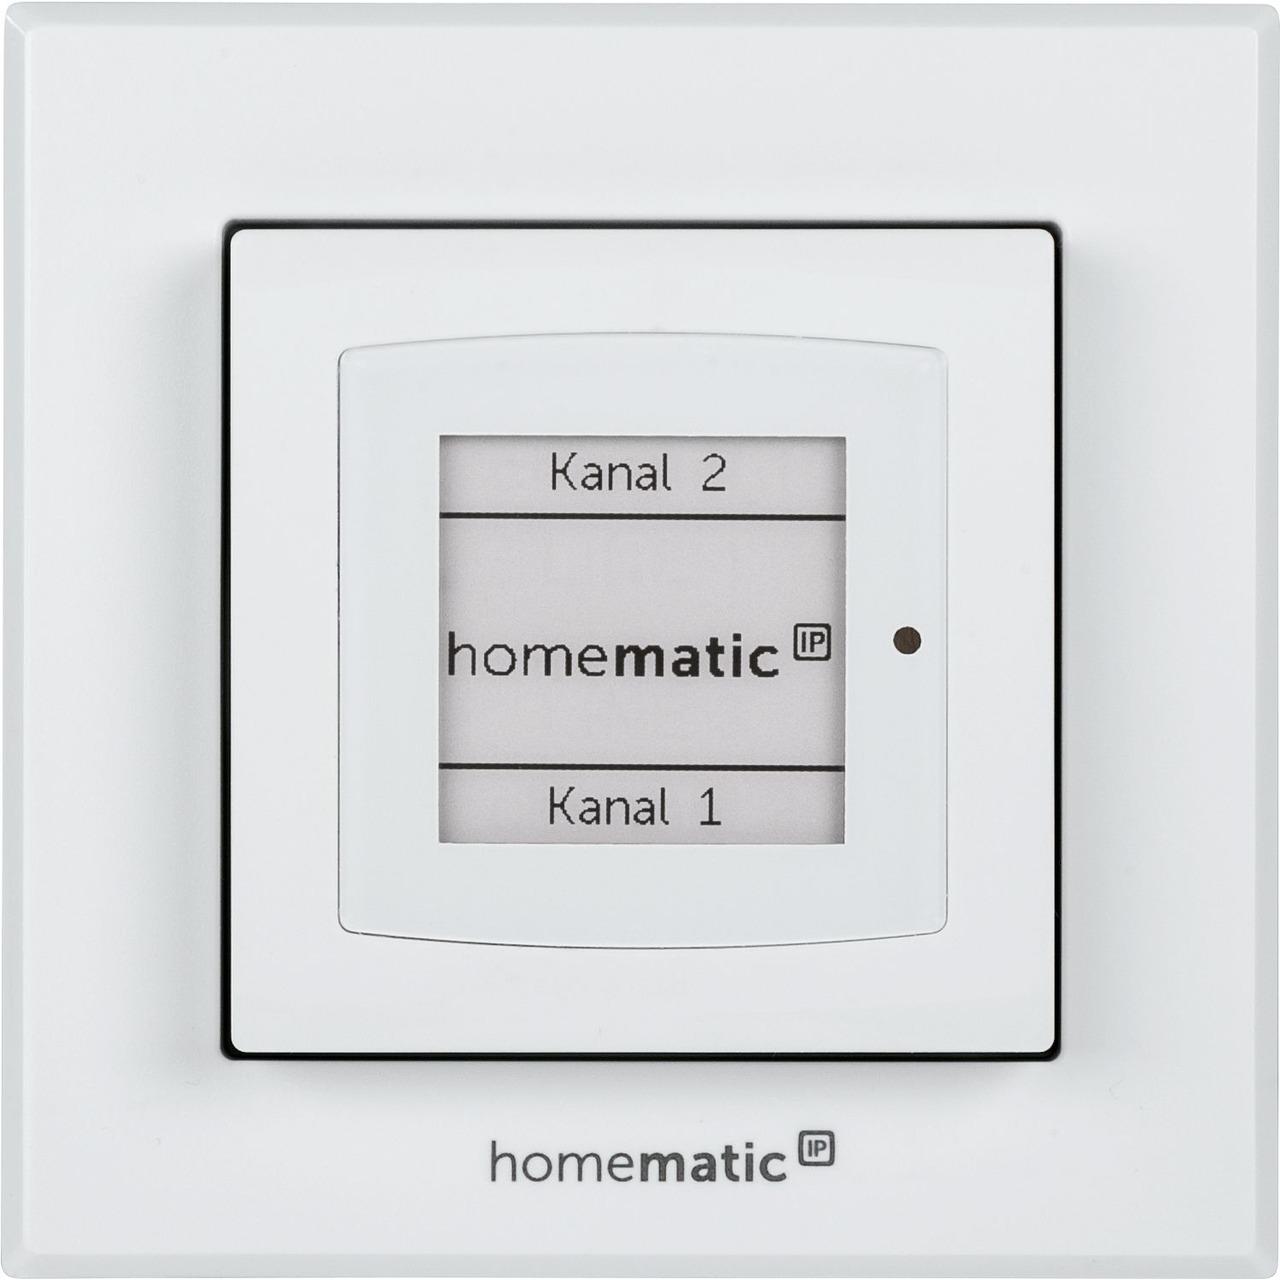 ELV Homematic IP Bausatz Wandtaster mit E-Paper-Statusdisplay HmIP-WRCD